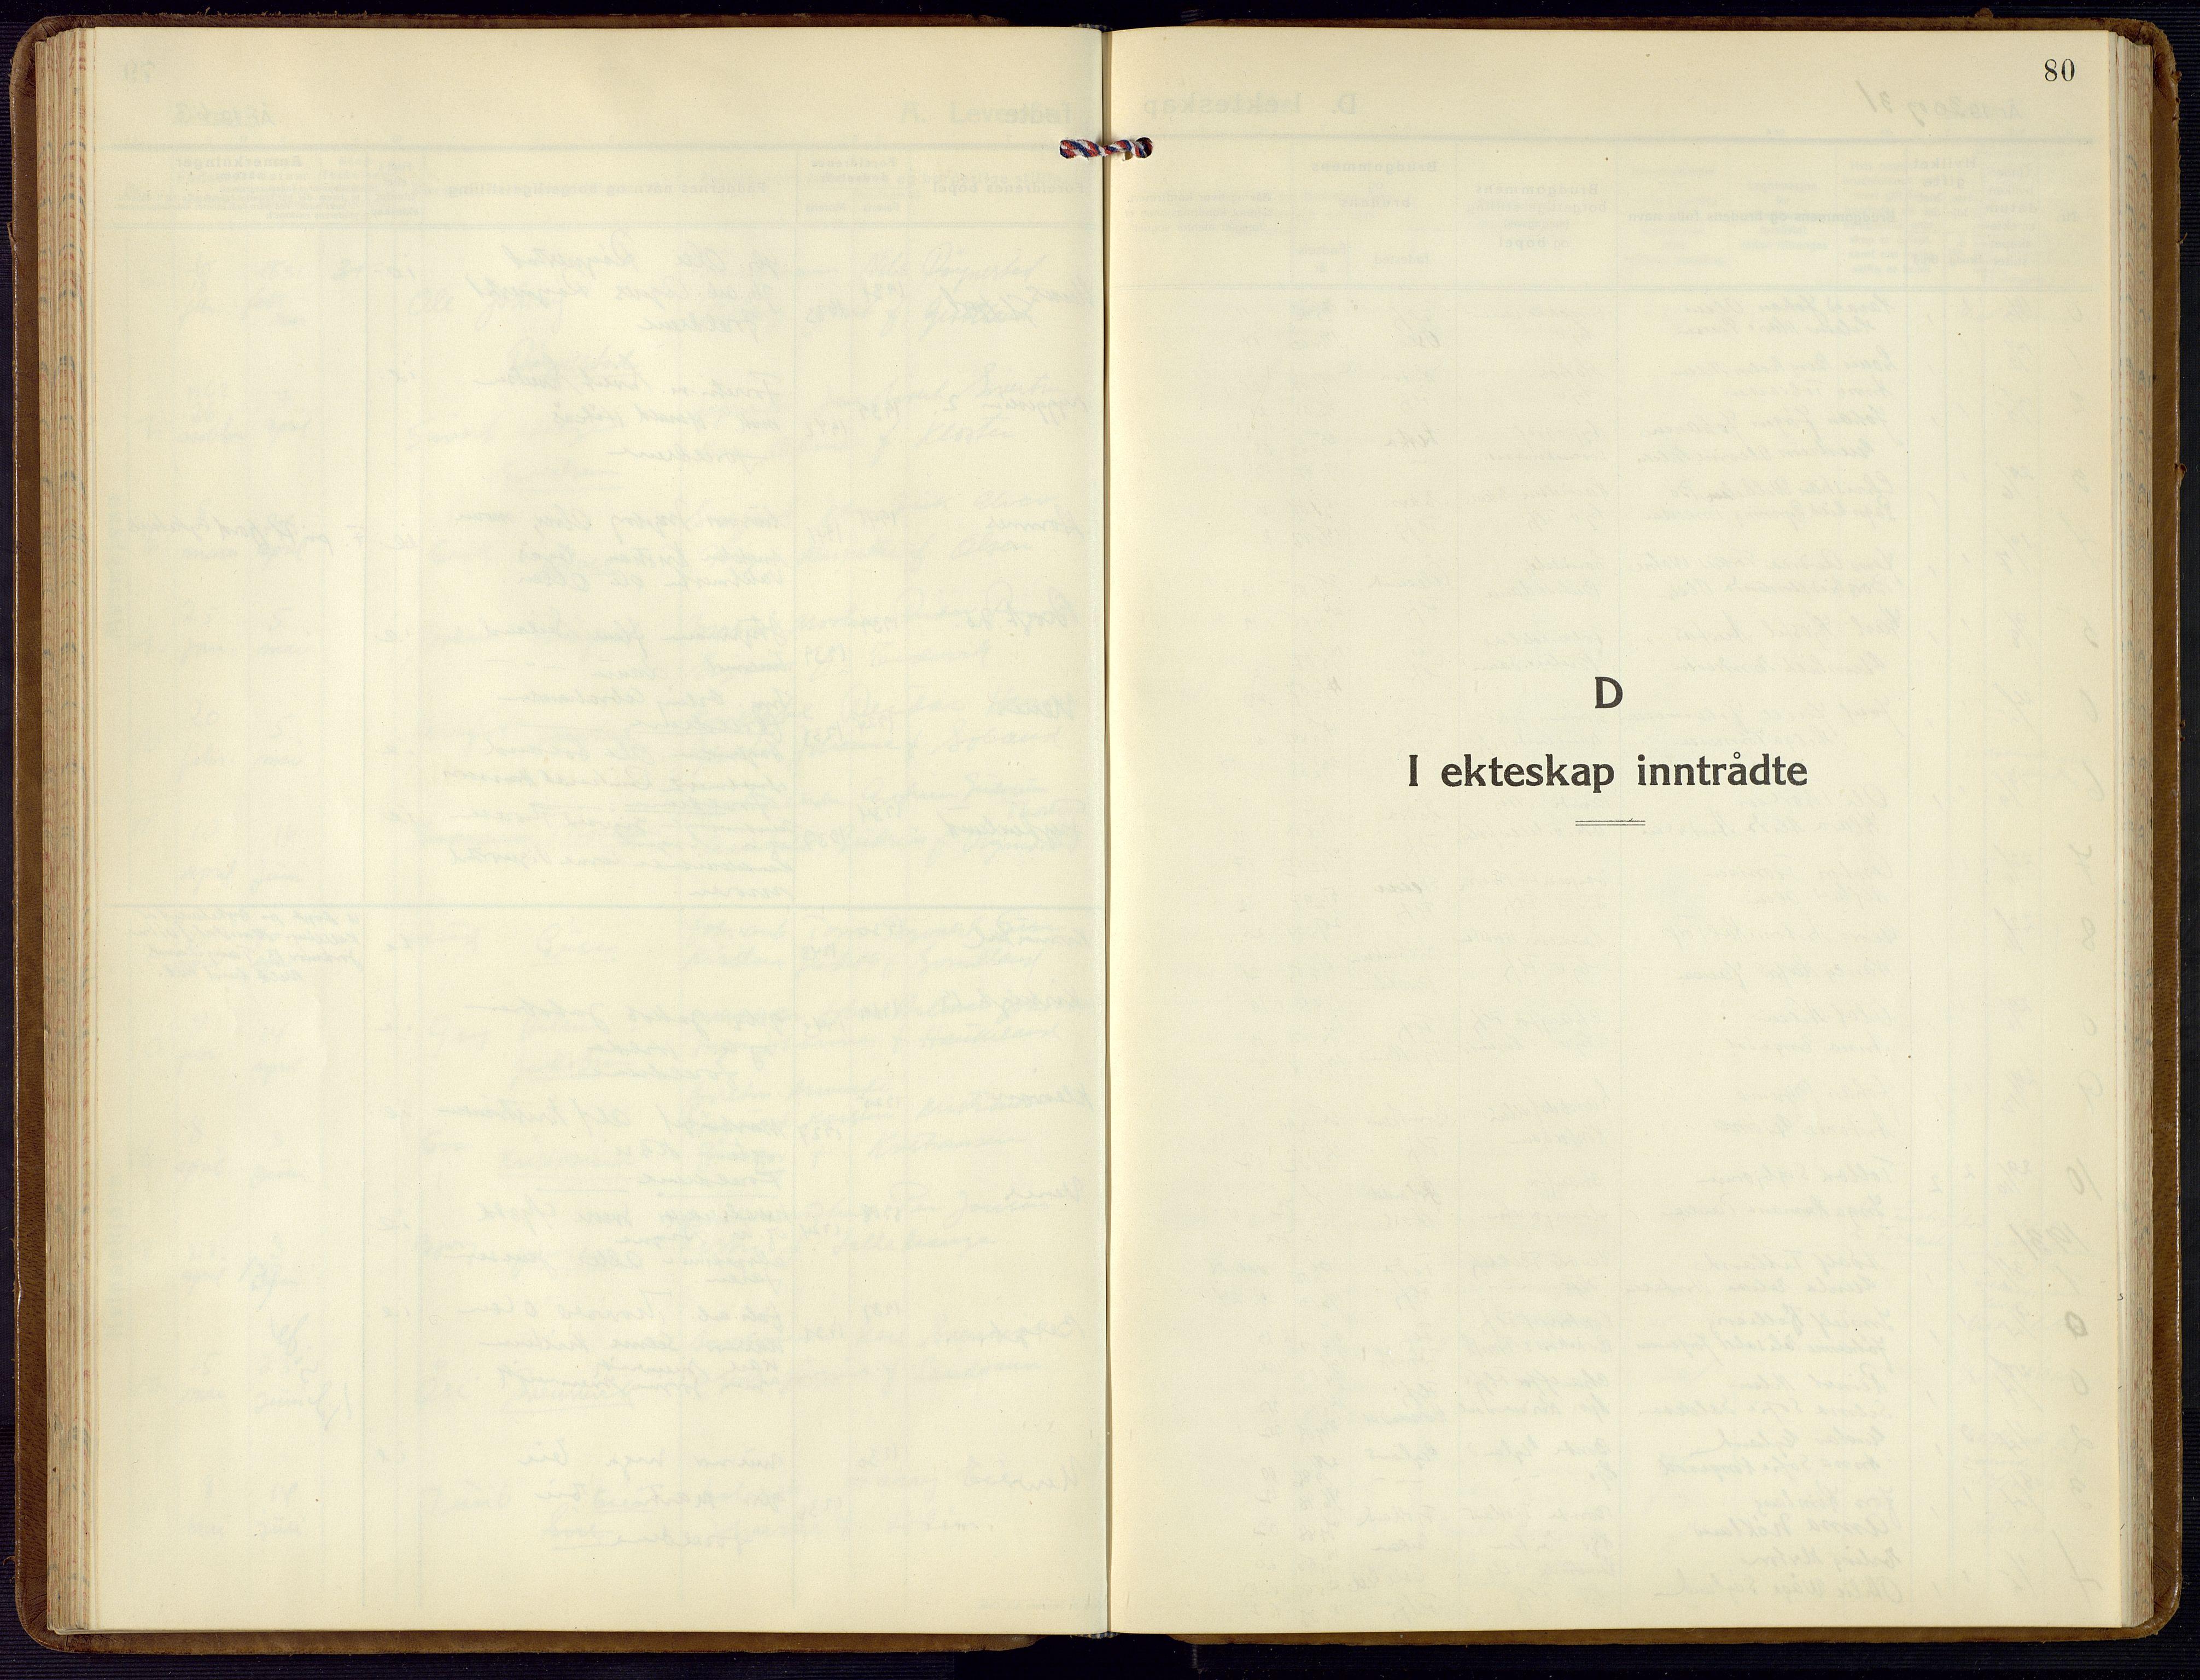 SAK, Flekkefjord sokneprestkontor, F/Fb/Fba/L0003: Klokkerbok nr. B 3, 1932-1969, s. 80